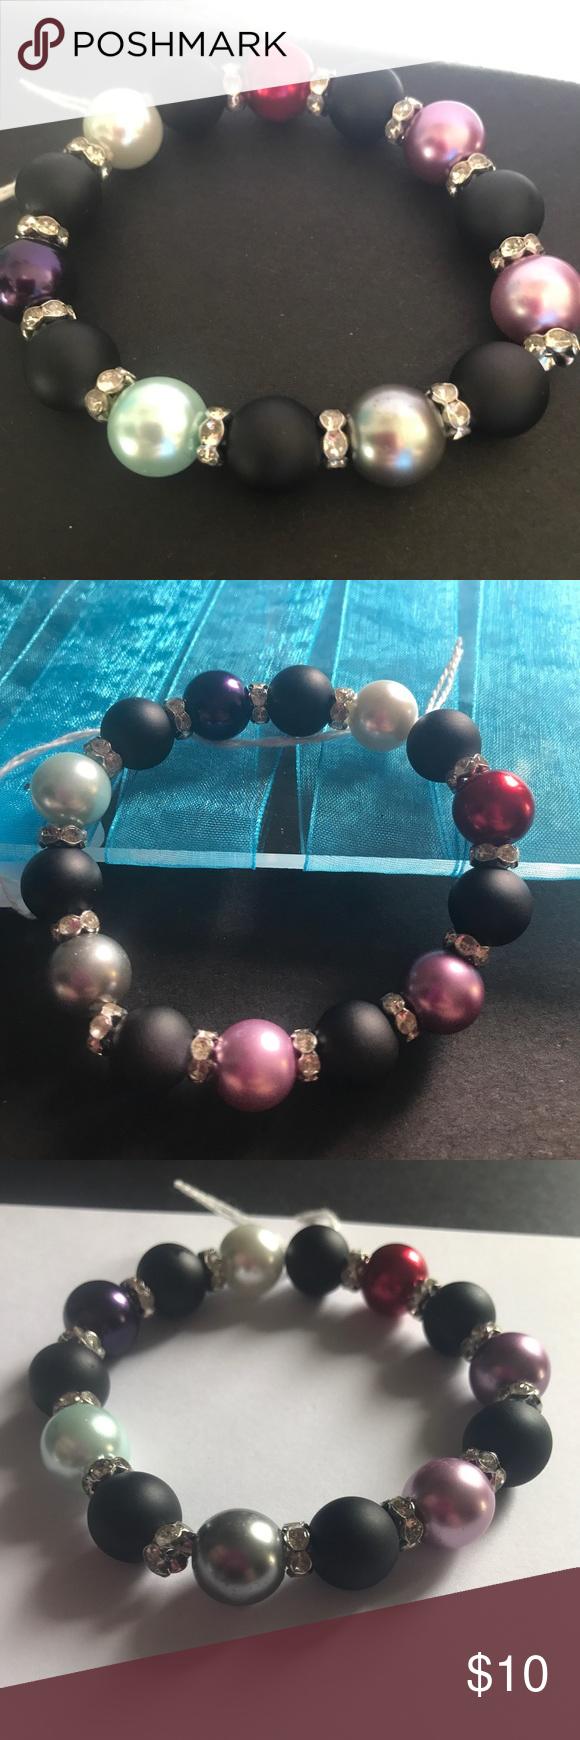 Pearl and matte bracelet Handmade black glass matte beads, color pearl glass beads, and Czech rhinestones. kraftykreps Jewelry Bracelets